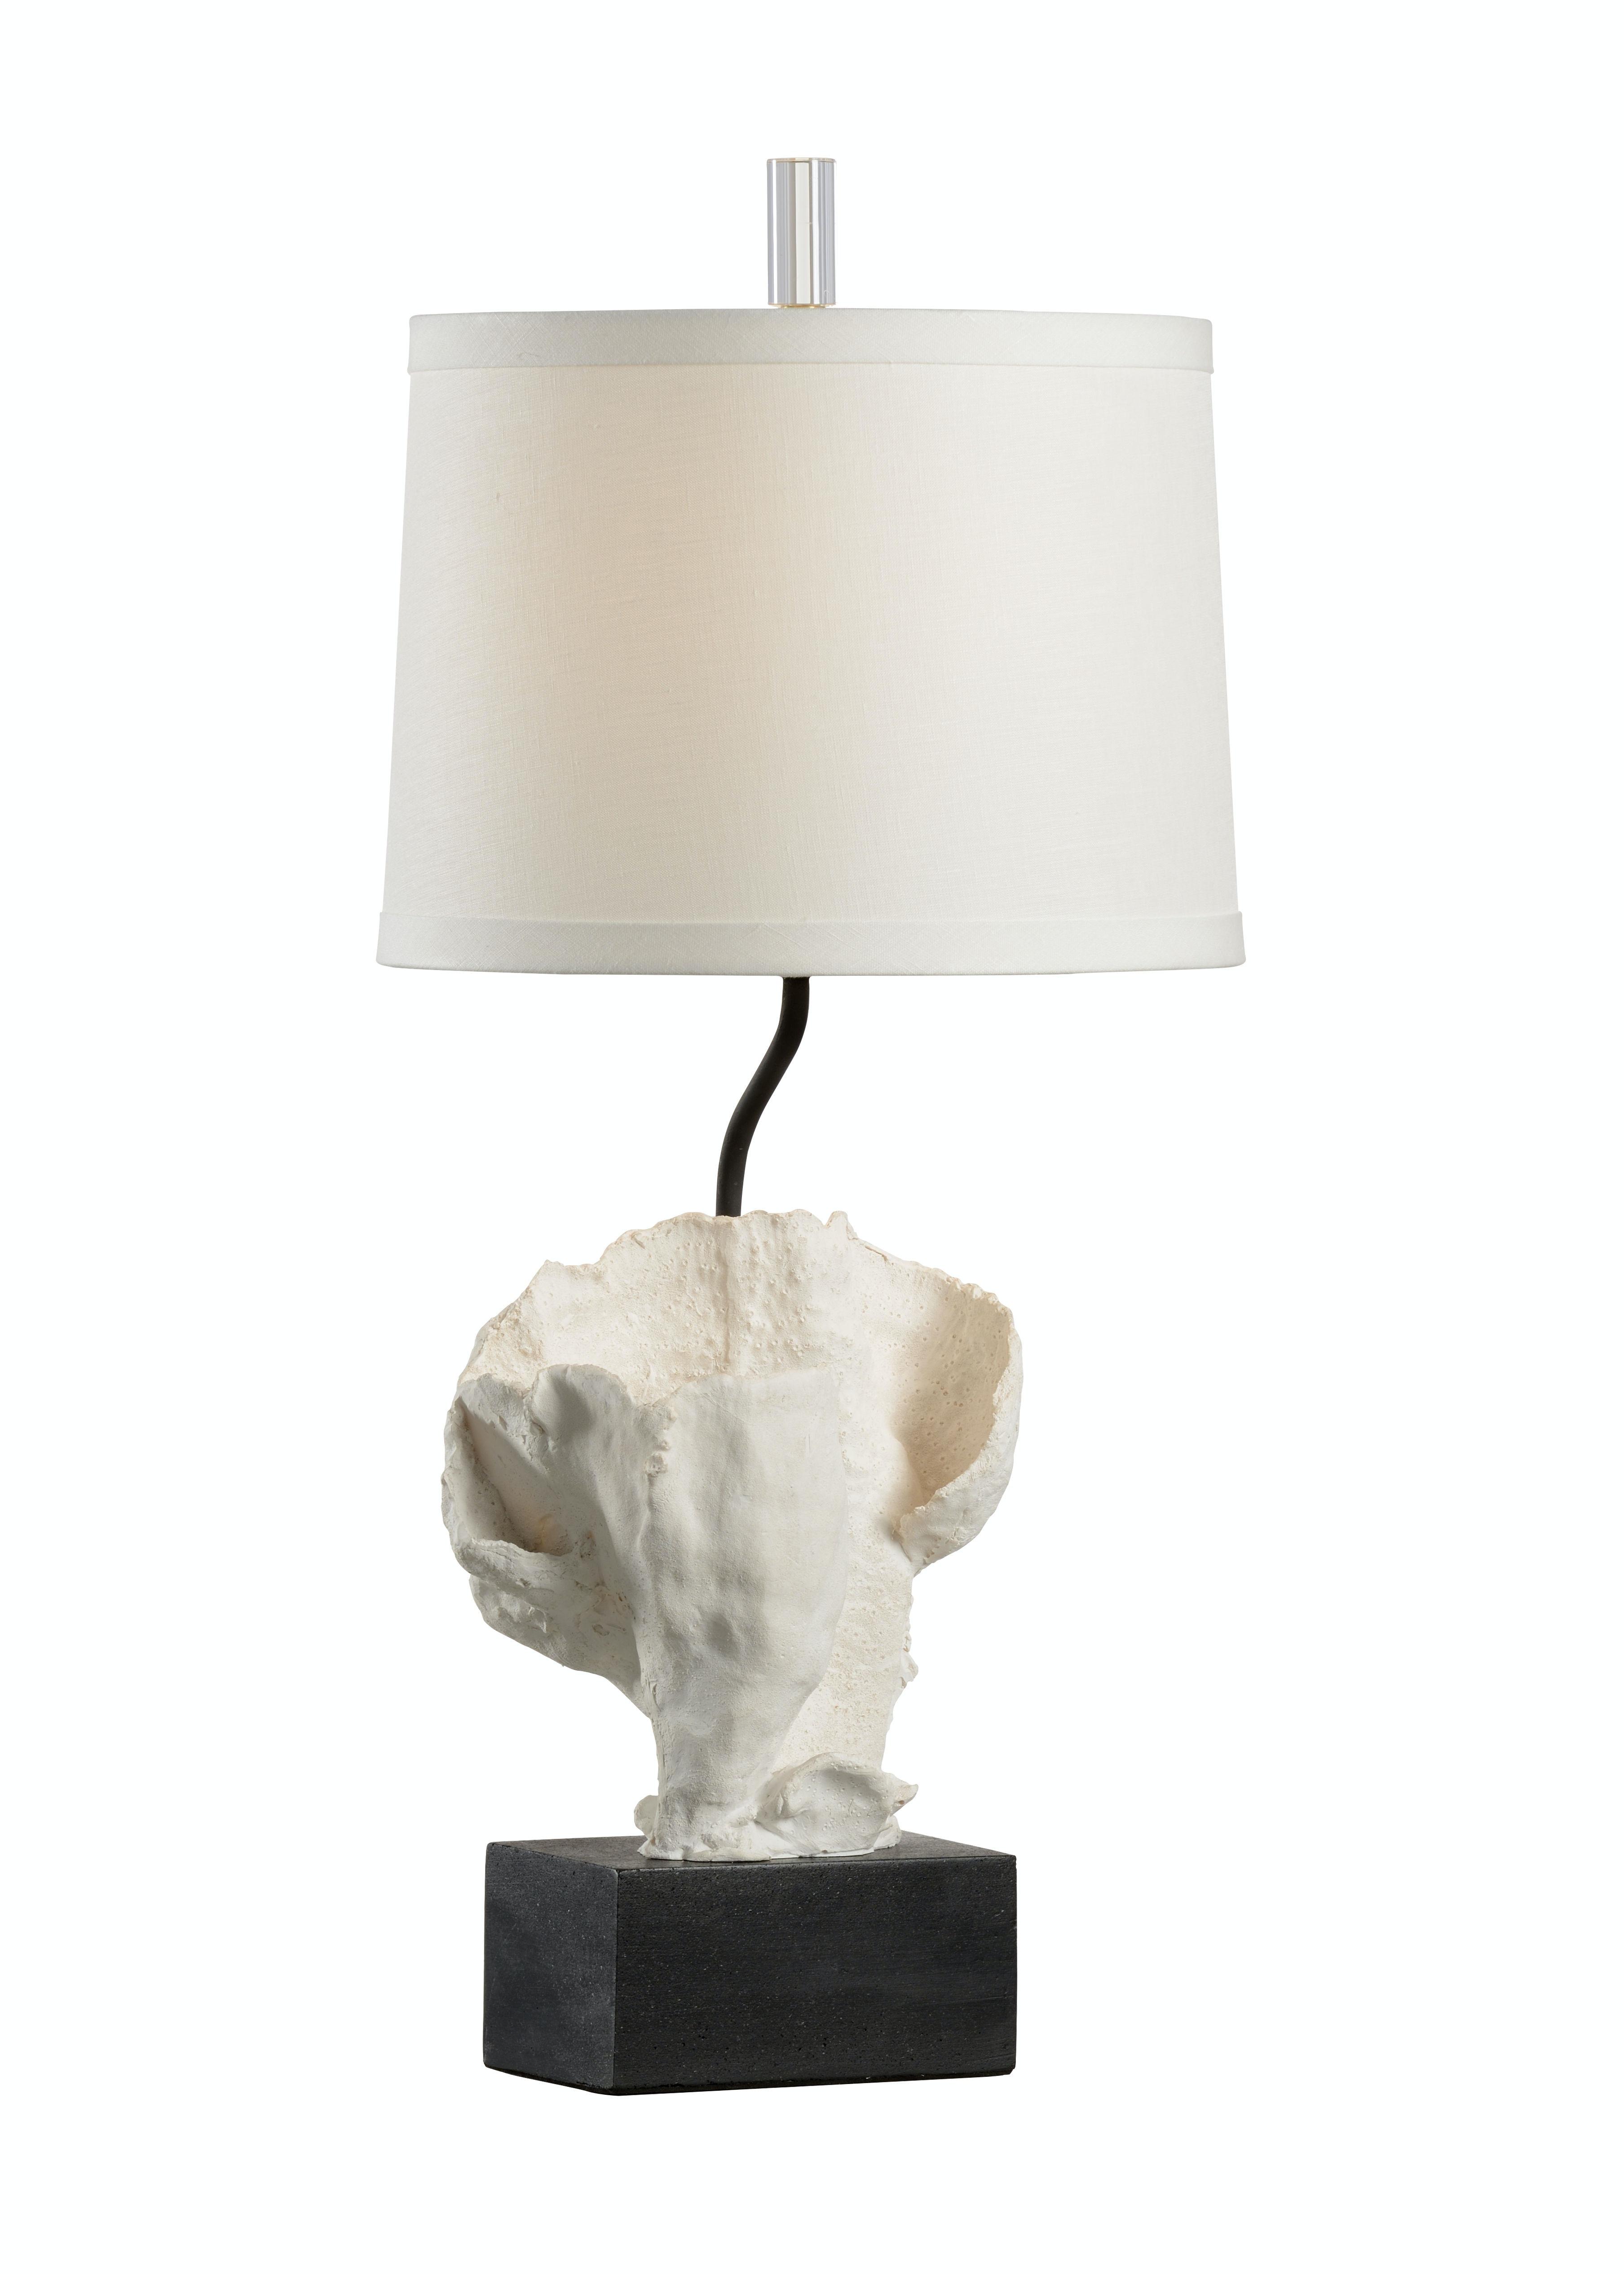 Brand-new Wildwood Lamps Furniture - Greenbaum Interiors - Montclair, Wayne  MQ17